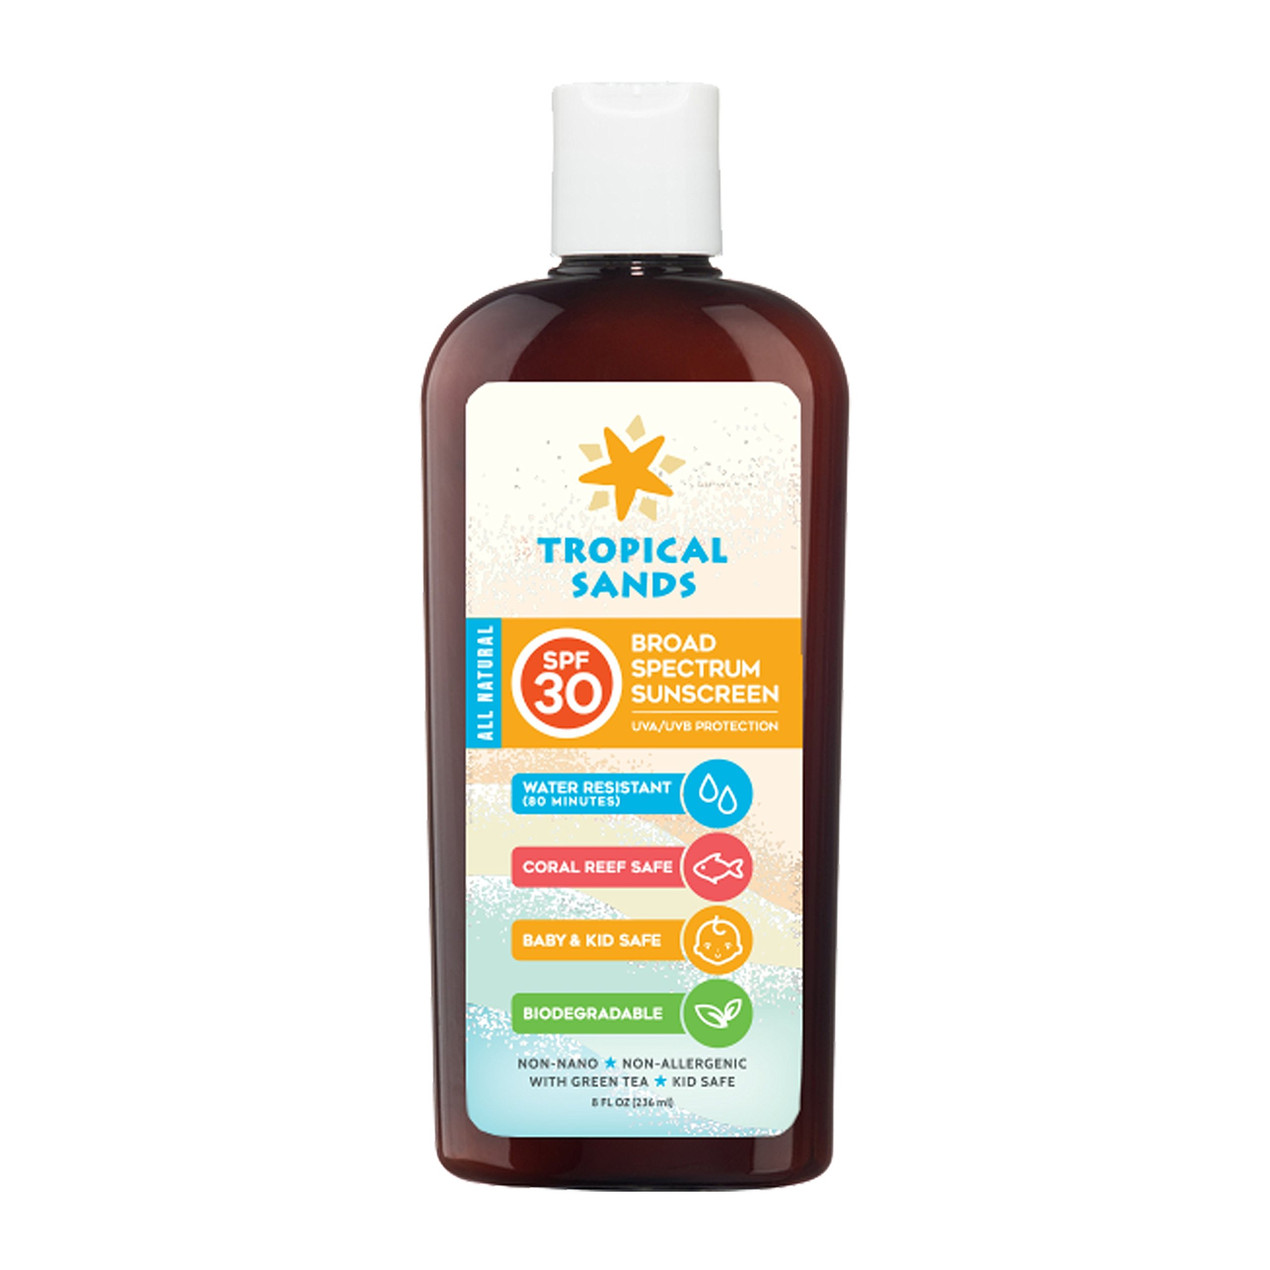 kiero.co | protector solar | producto